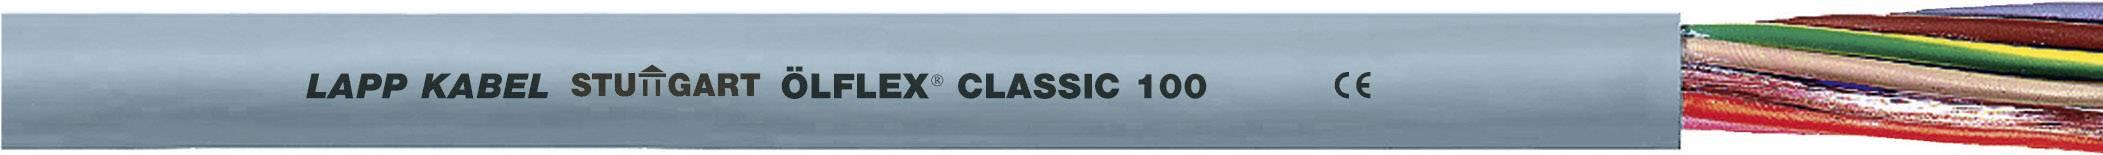 Kabel LappKabel Ölflex CLASSIC 100 2X0,5 (00100004), PVC, 4,8 mm, 500 V, šedá, 100 m